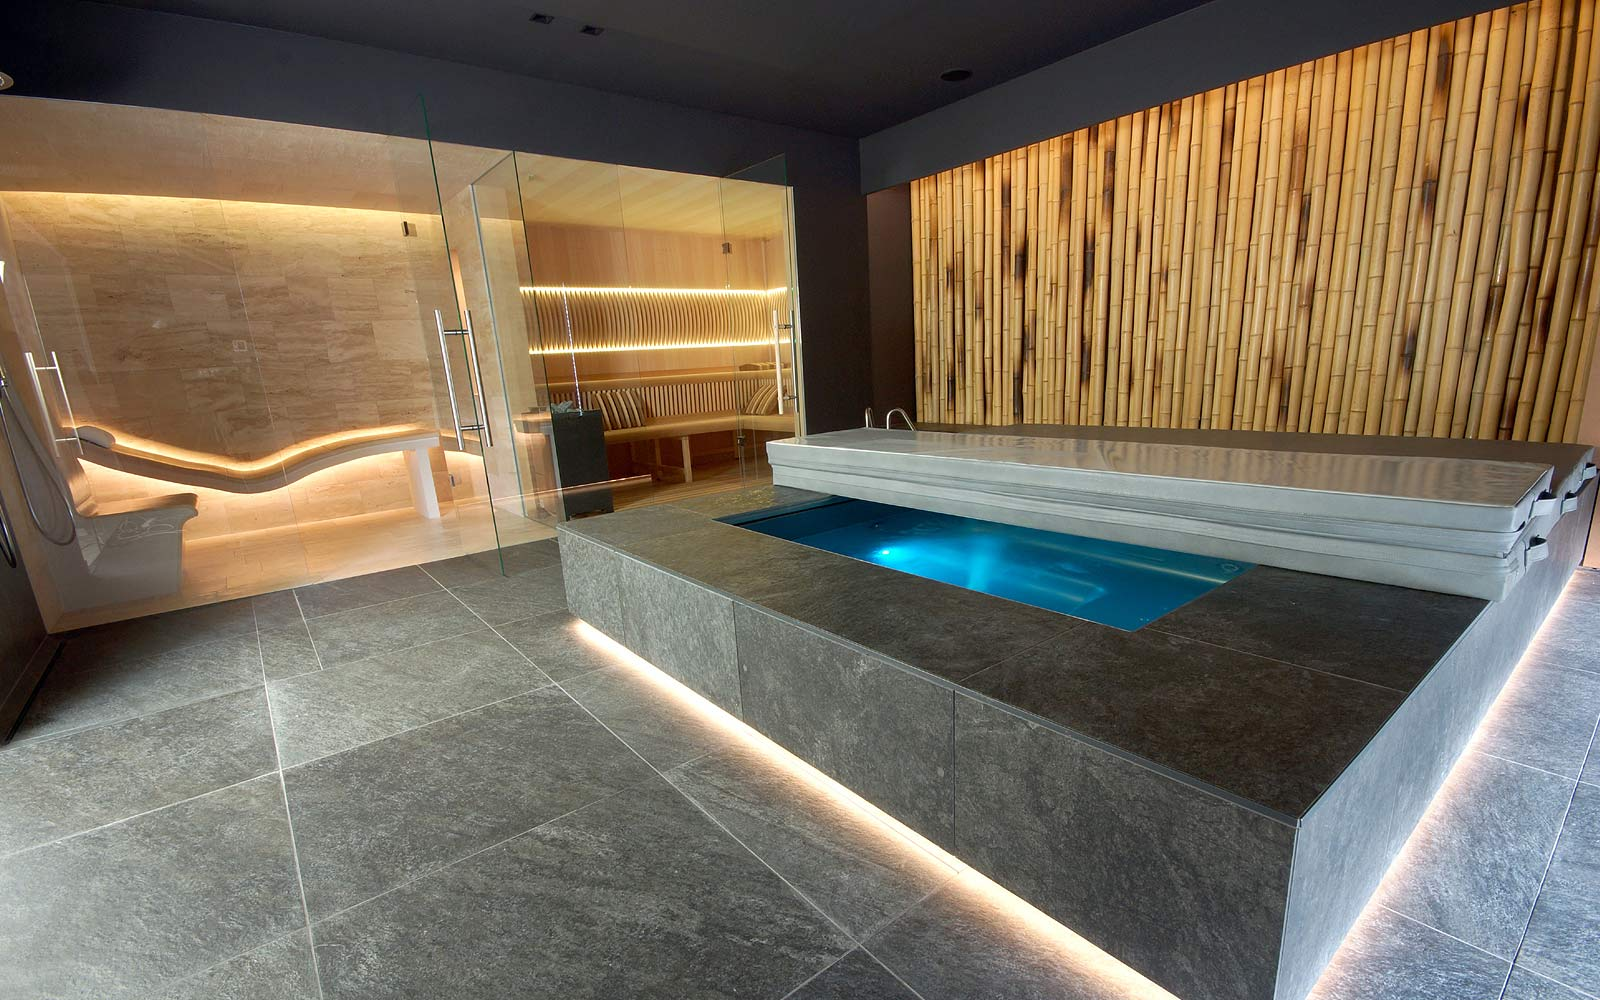 Sauna Future a tepidárium s vyhřívaným keramickým lehátkem